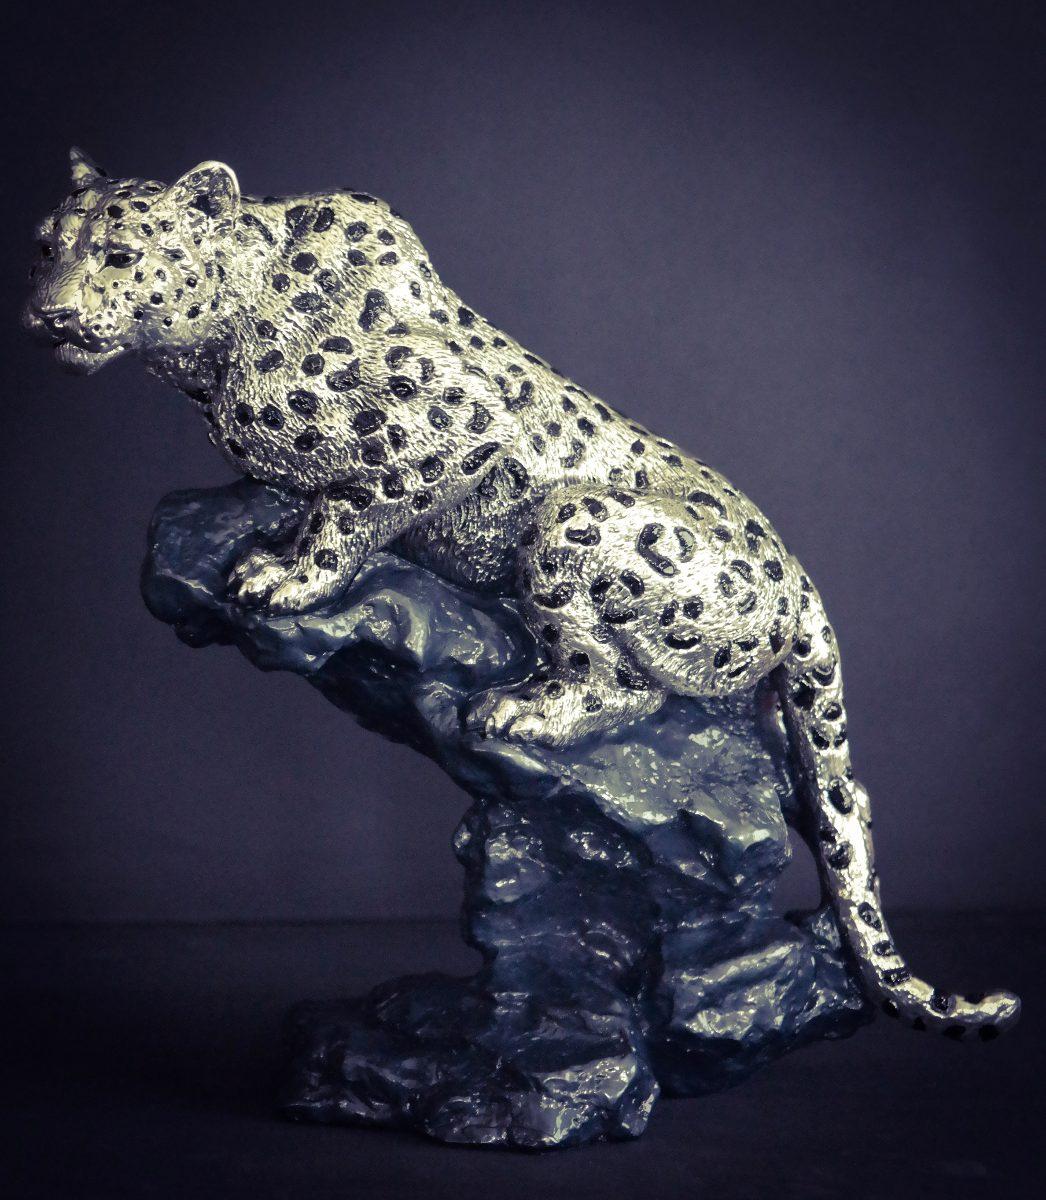 Escultura leopardo plata electroformado figura decorativa 6 en mercado libre - Escultura decorativa ...